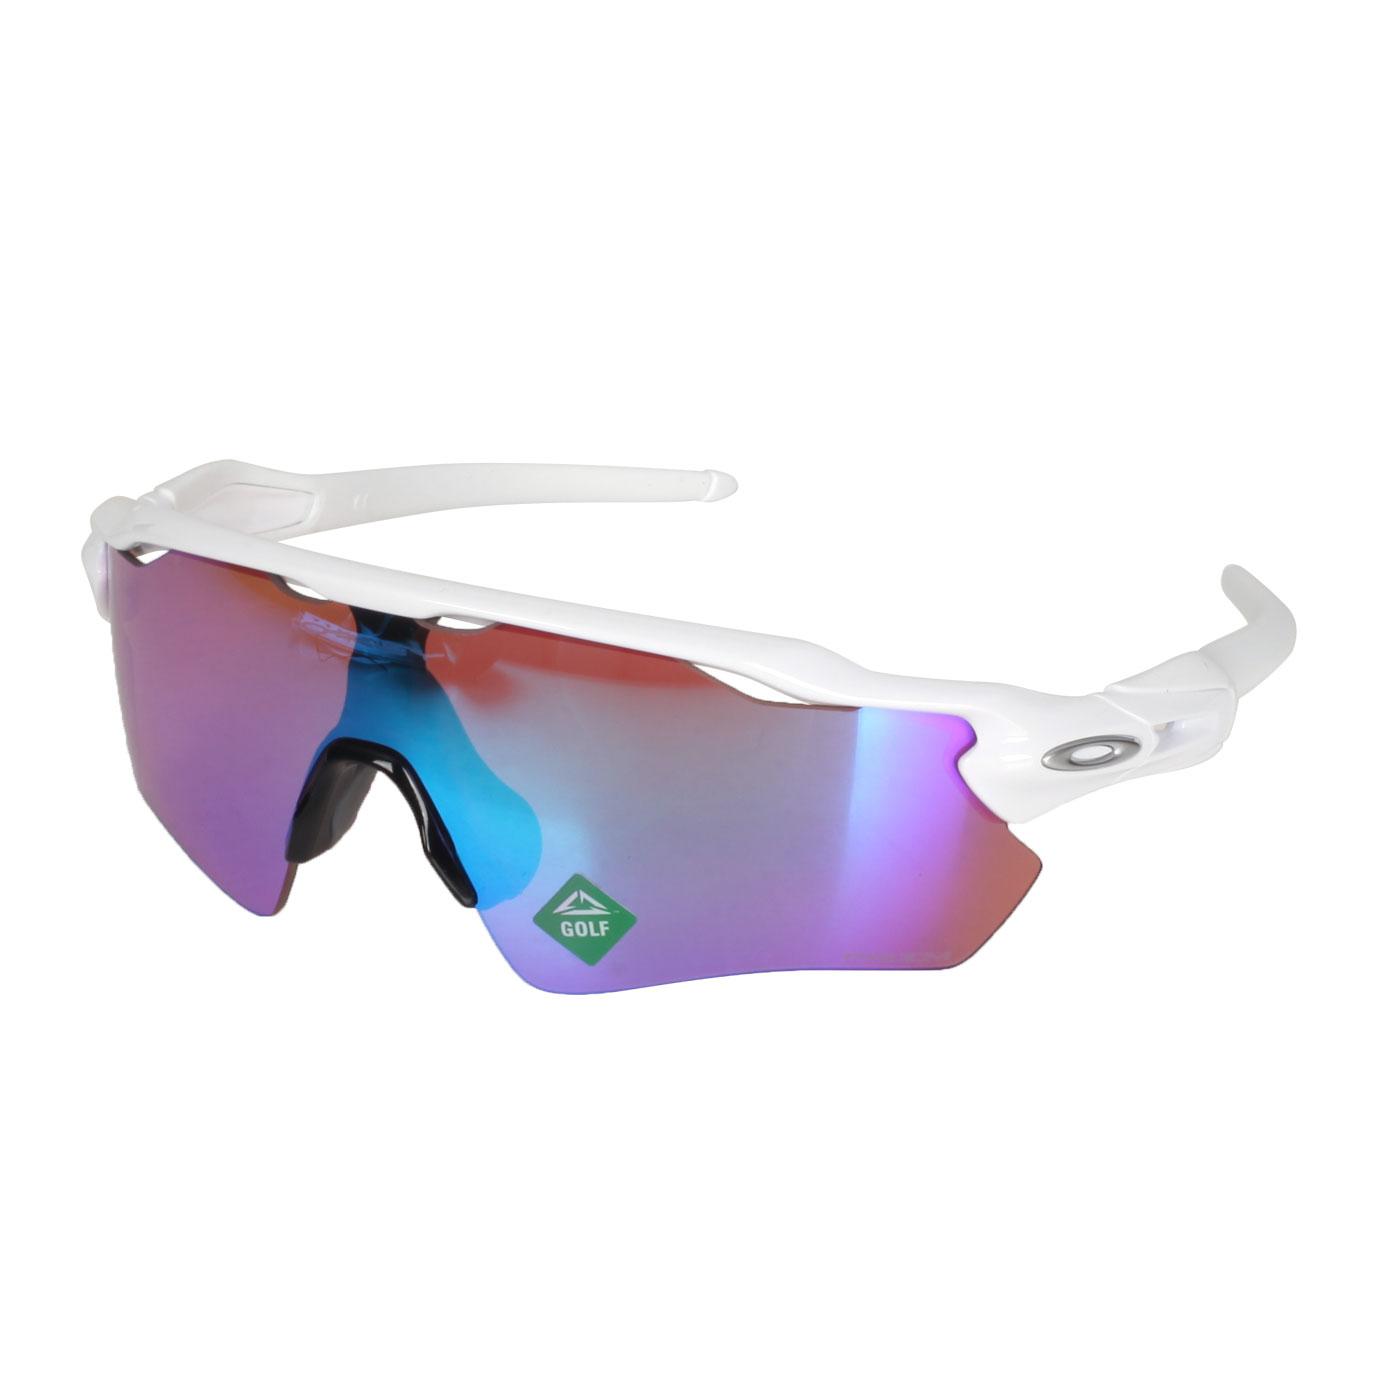 OAKLEY RADAR EV PATH一般太陽眼鏡(附硬盒鼻墊) OAK-OO9208-A538 - 白紫銀